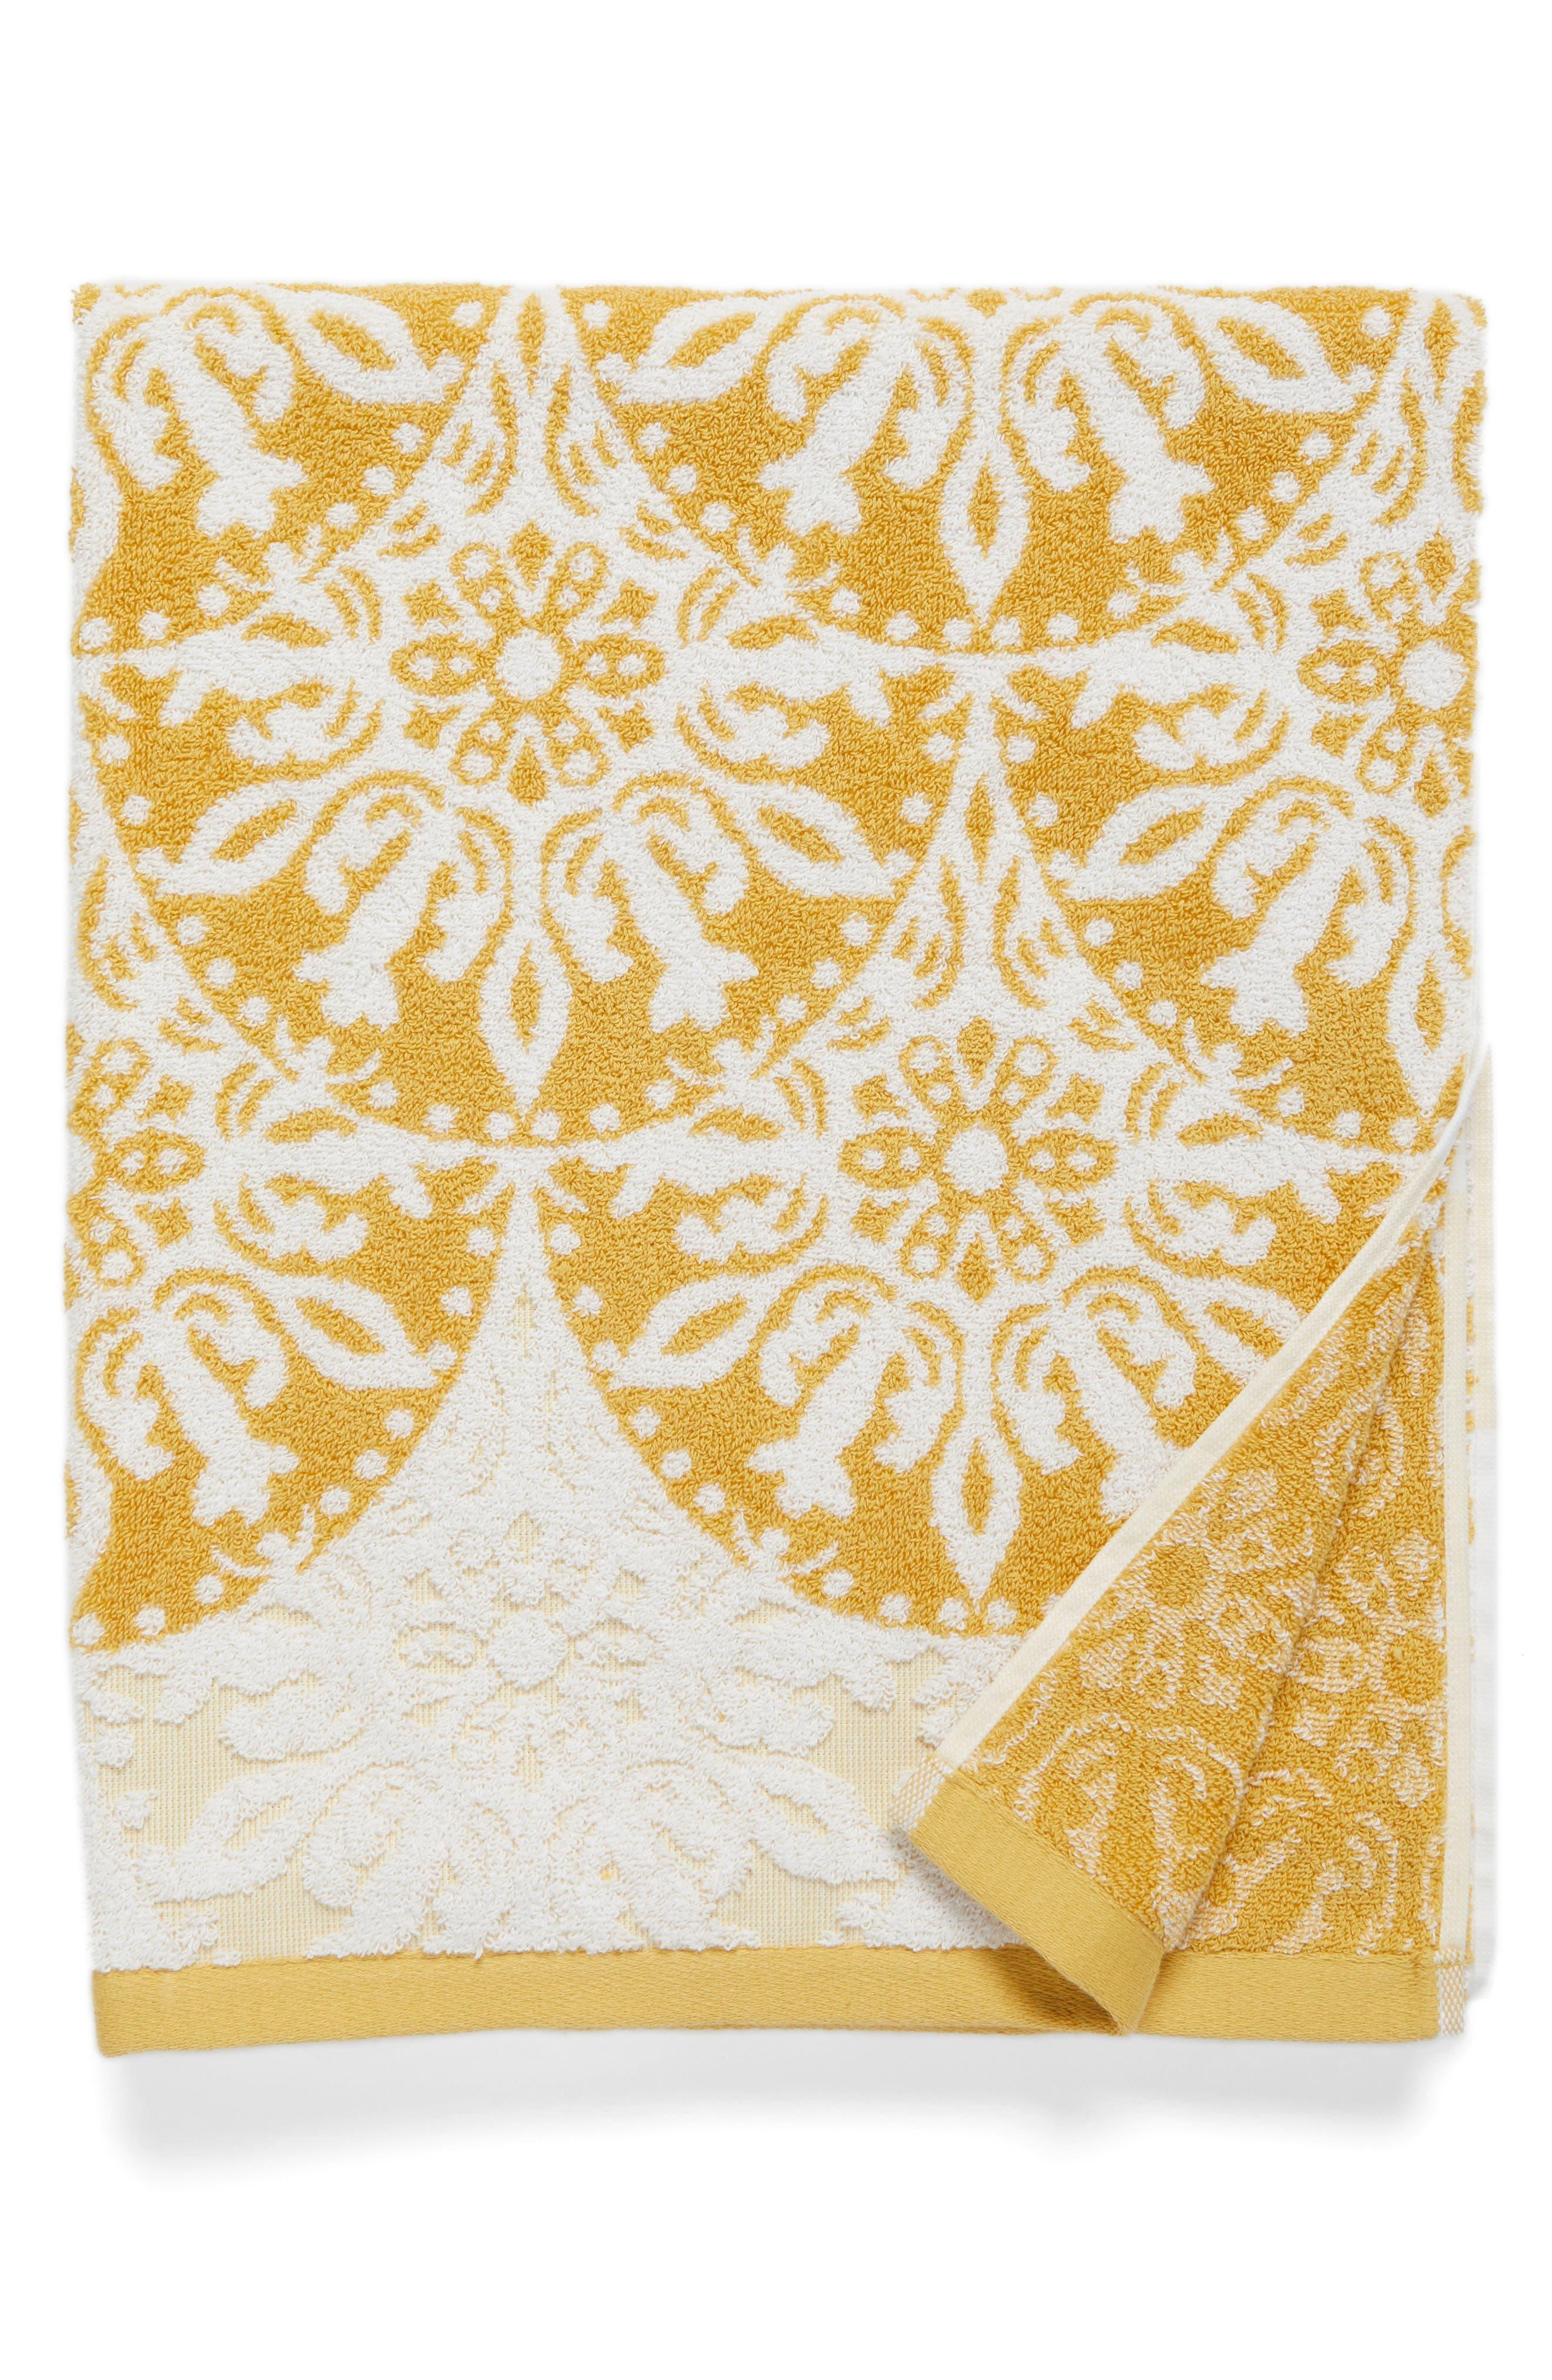 Nordstrom at Home Fan Ombré Jacquard Bath Towel (2 for $49)